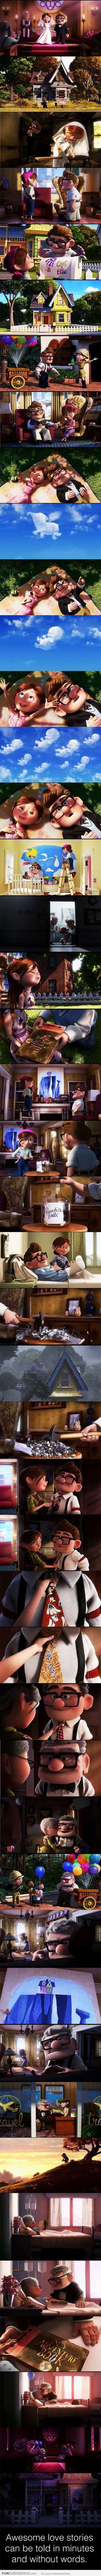 stori, disney movies, heart, twilight, one word, book, montages, pixar movies, films